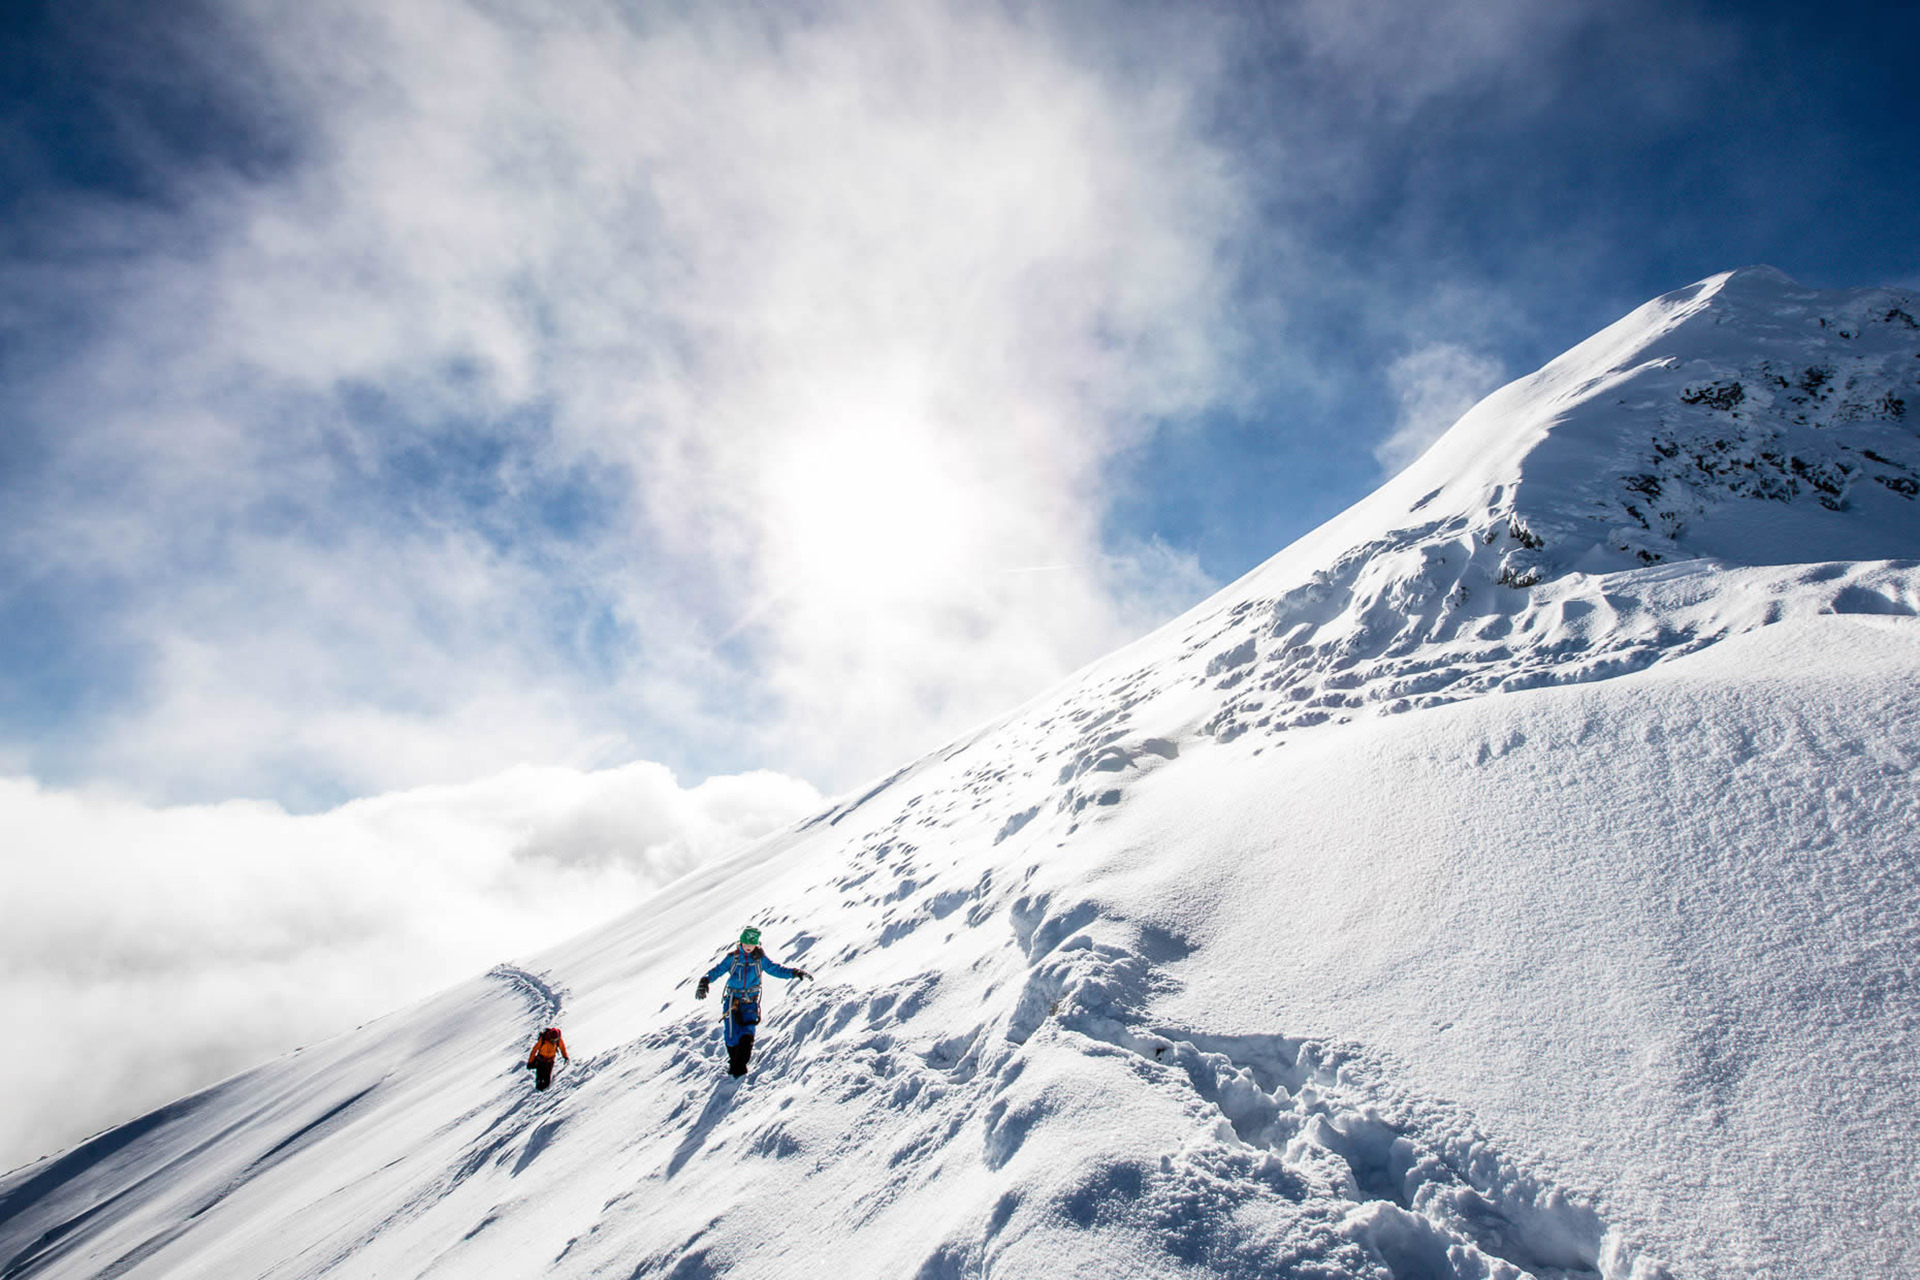 berg-schnee-tour-sonne-winter